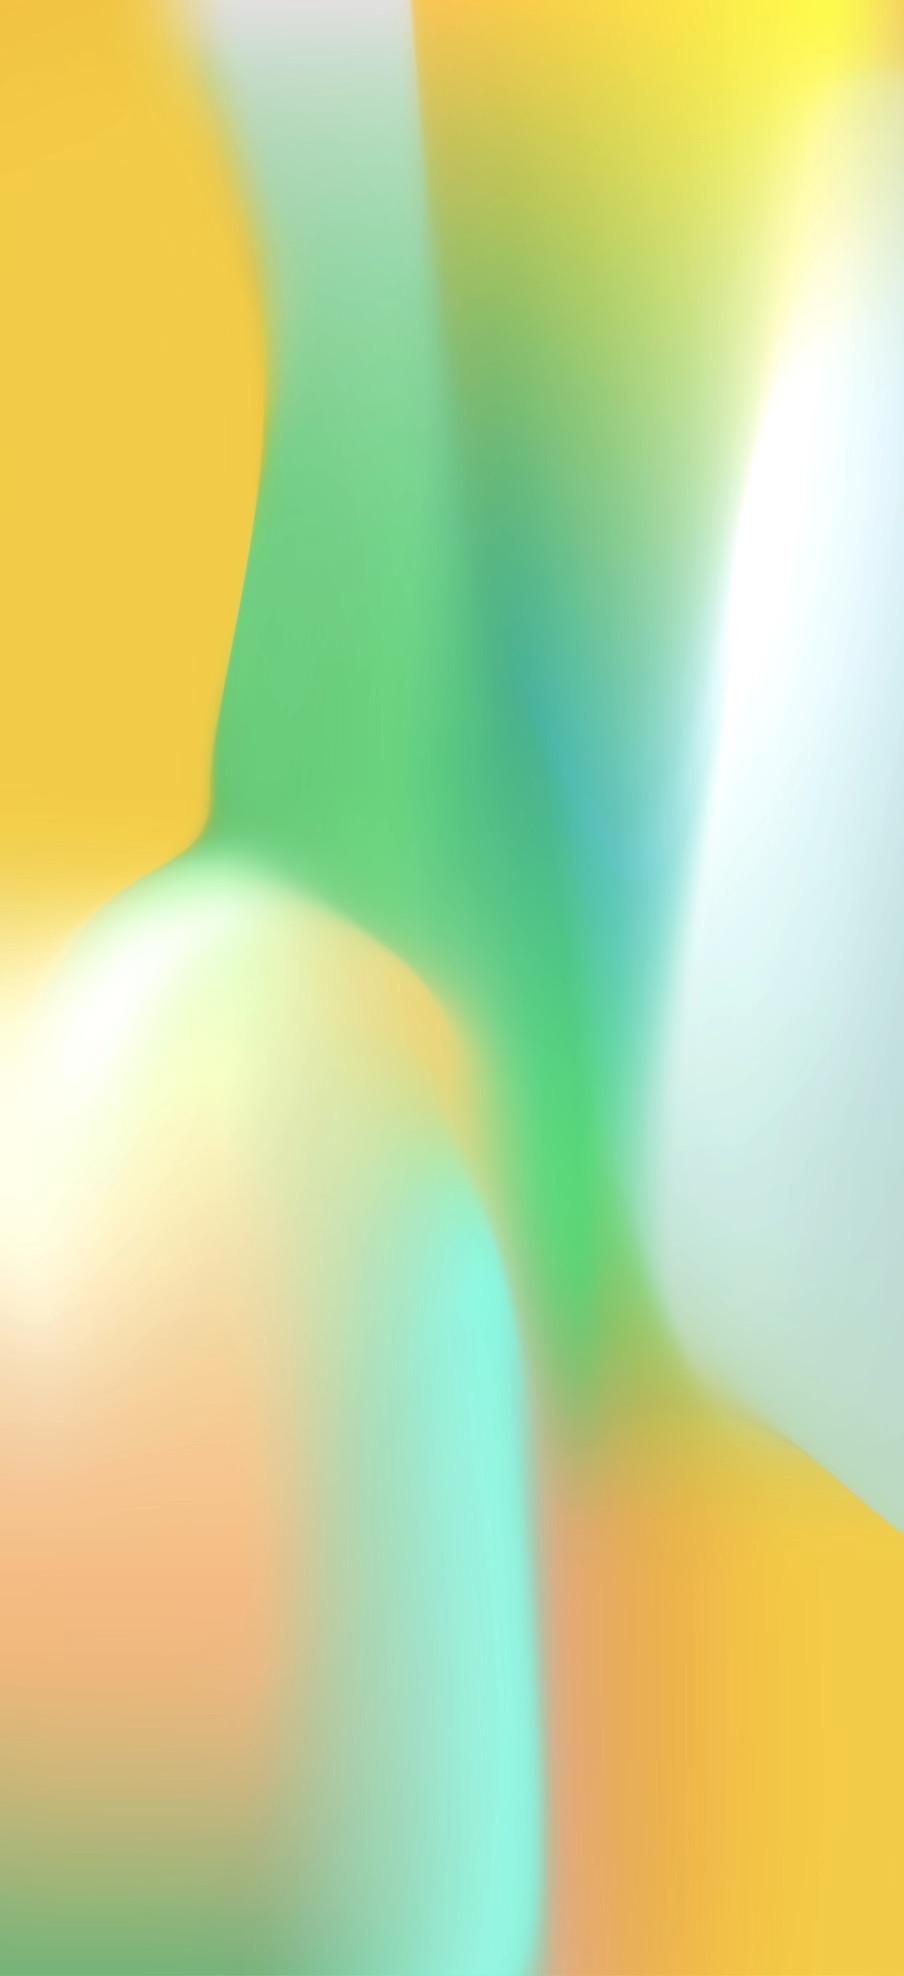 Ios Live Wallpaper Iphone X Pobierz Nowe Tapety Z Ios 11 2 I Iphone A X Thinkapple